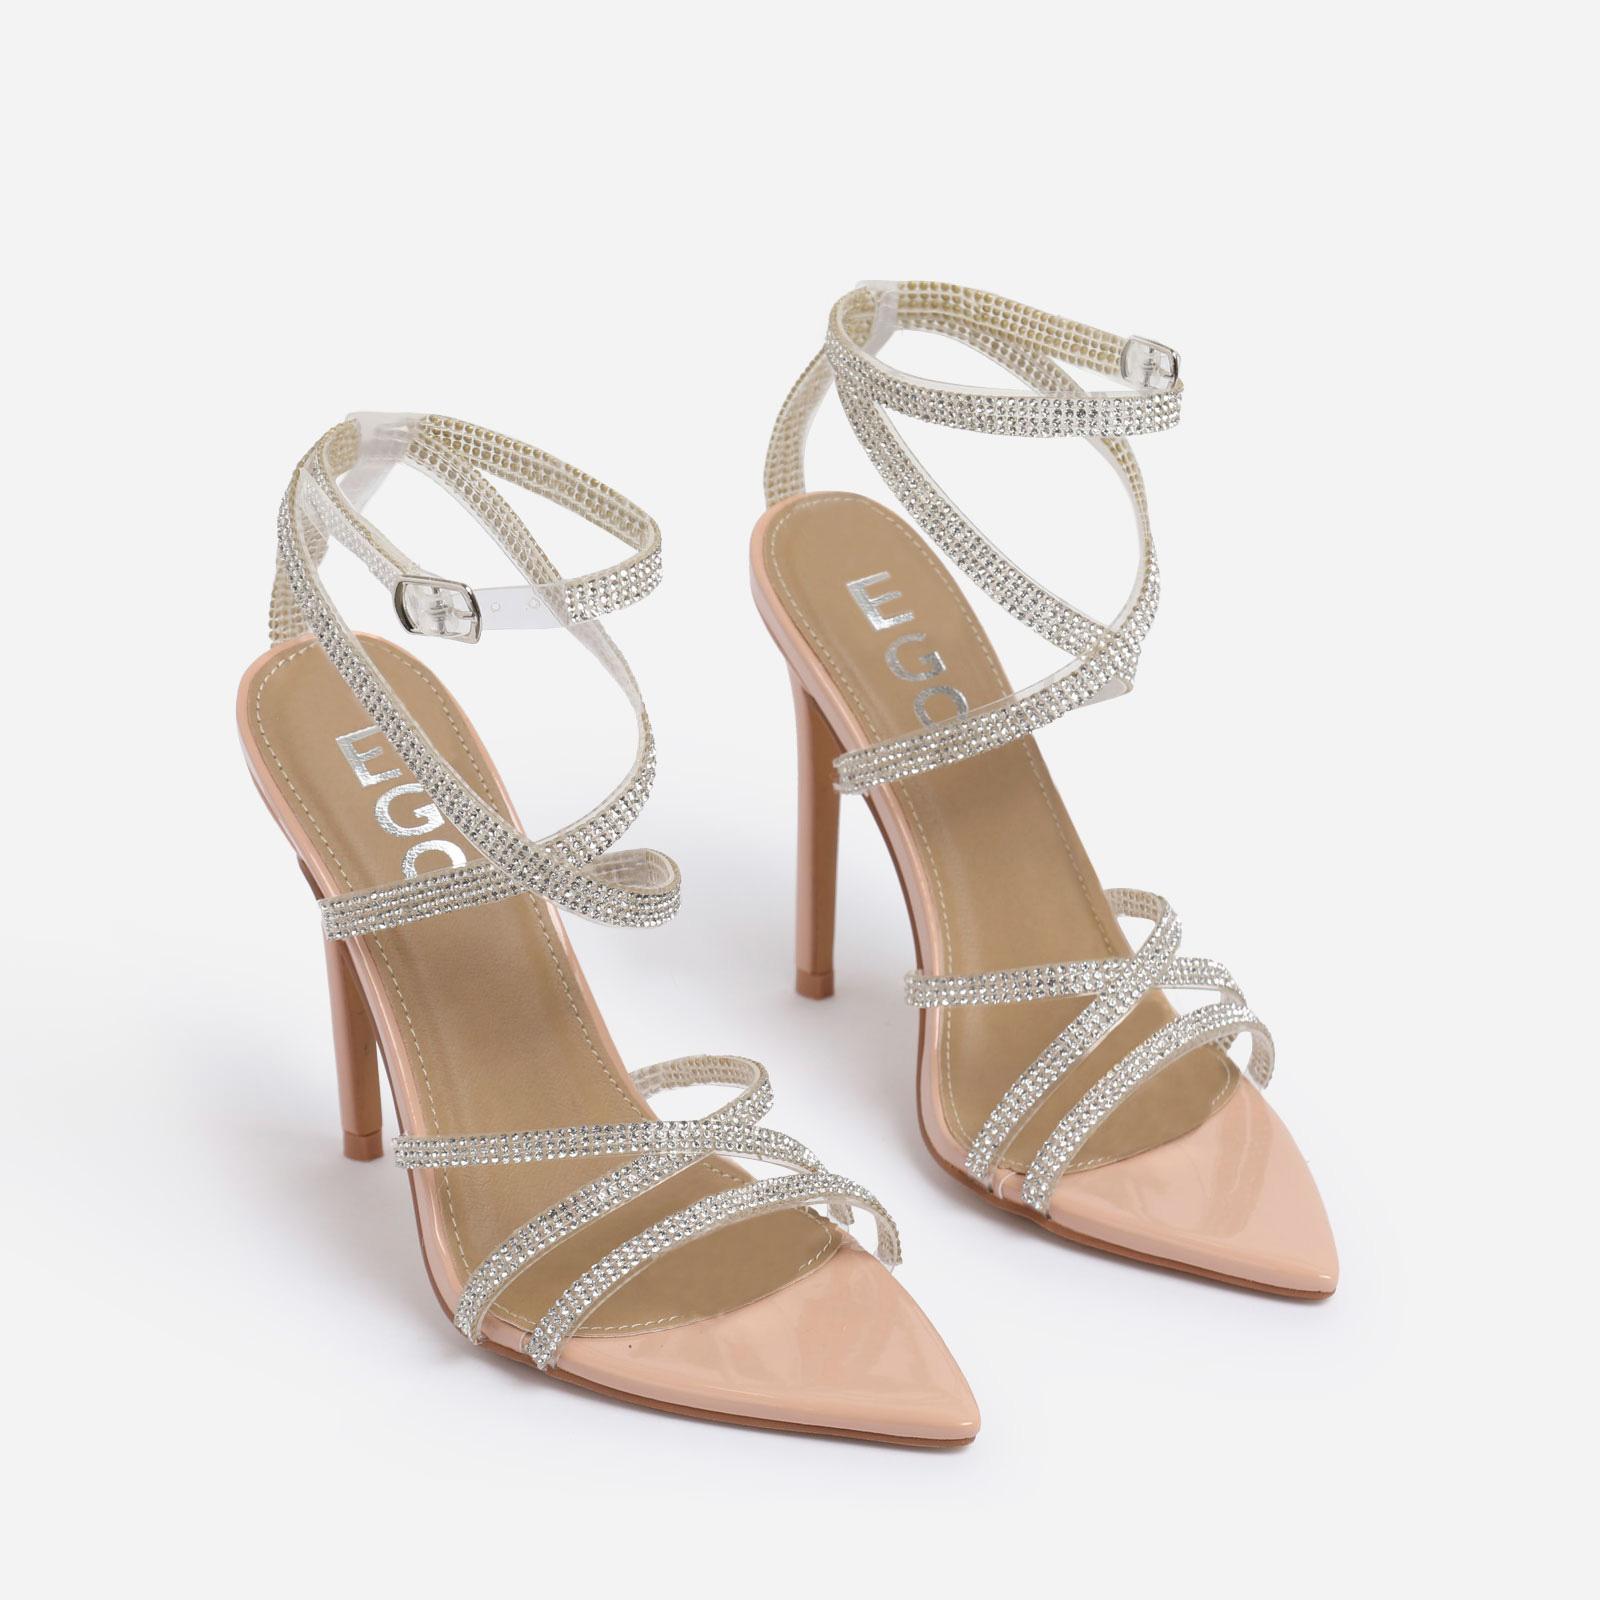 Precious Diamante Detail Pointed Toe Heel In Nude Patent